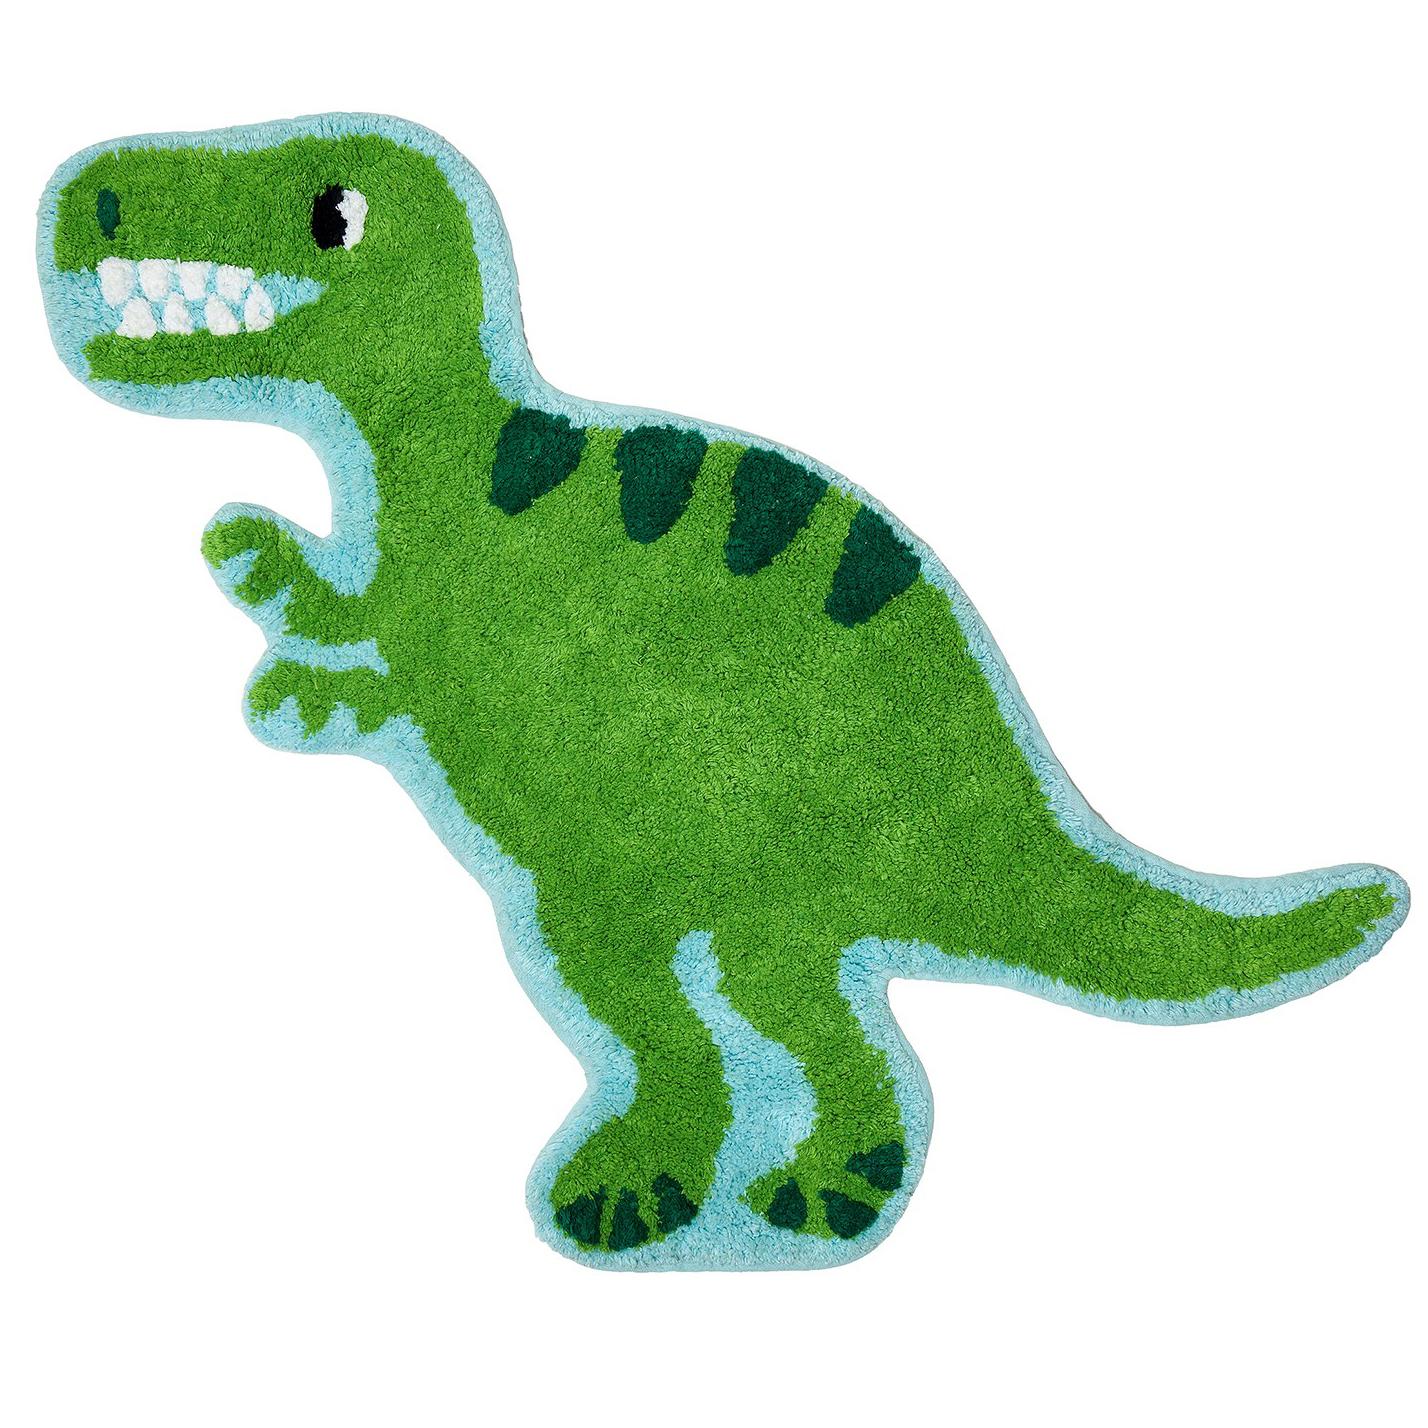 Matta Dino Dinosaur • Pryloteket